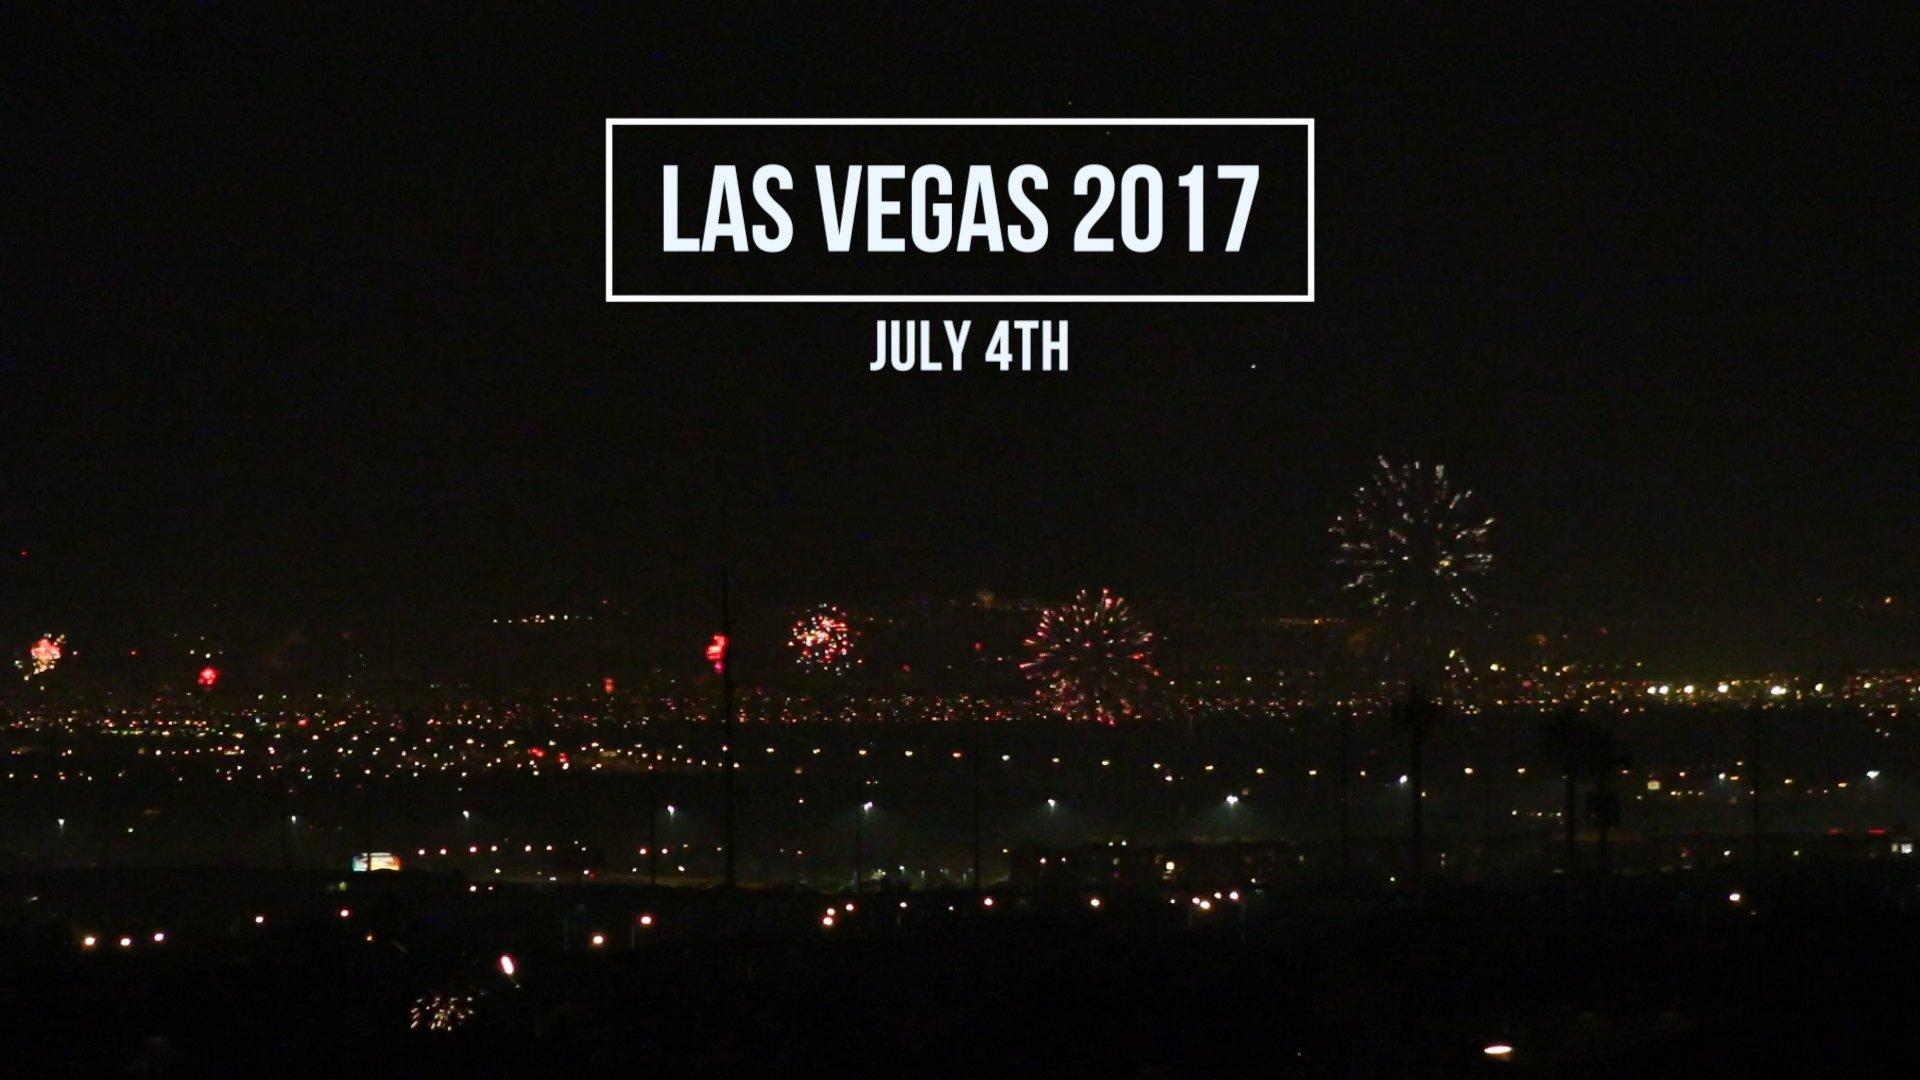 Las Vegas 2017, 4th of July Celebration - 42 Aspens ...  4th